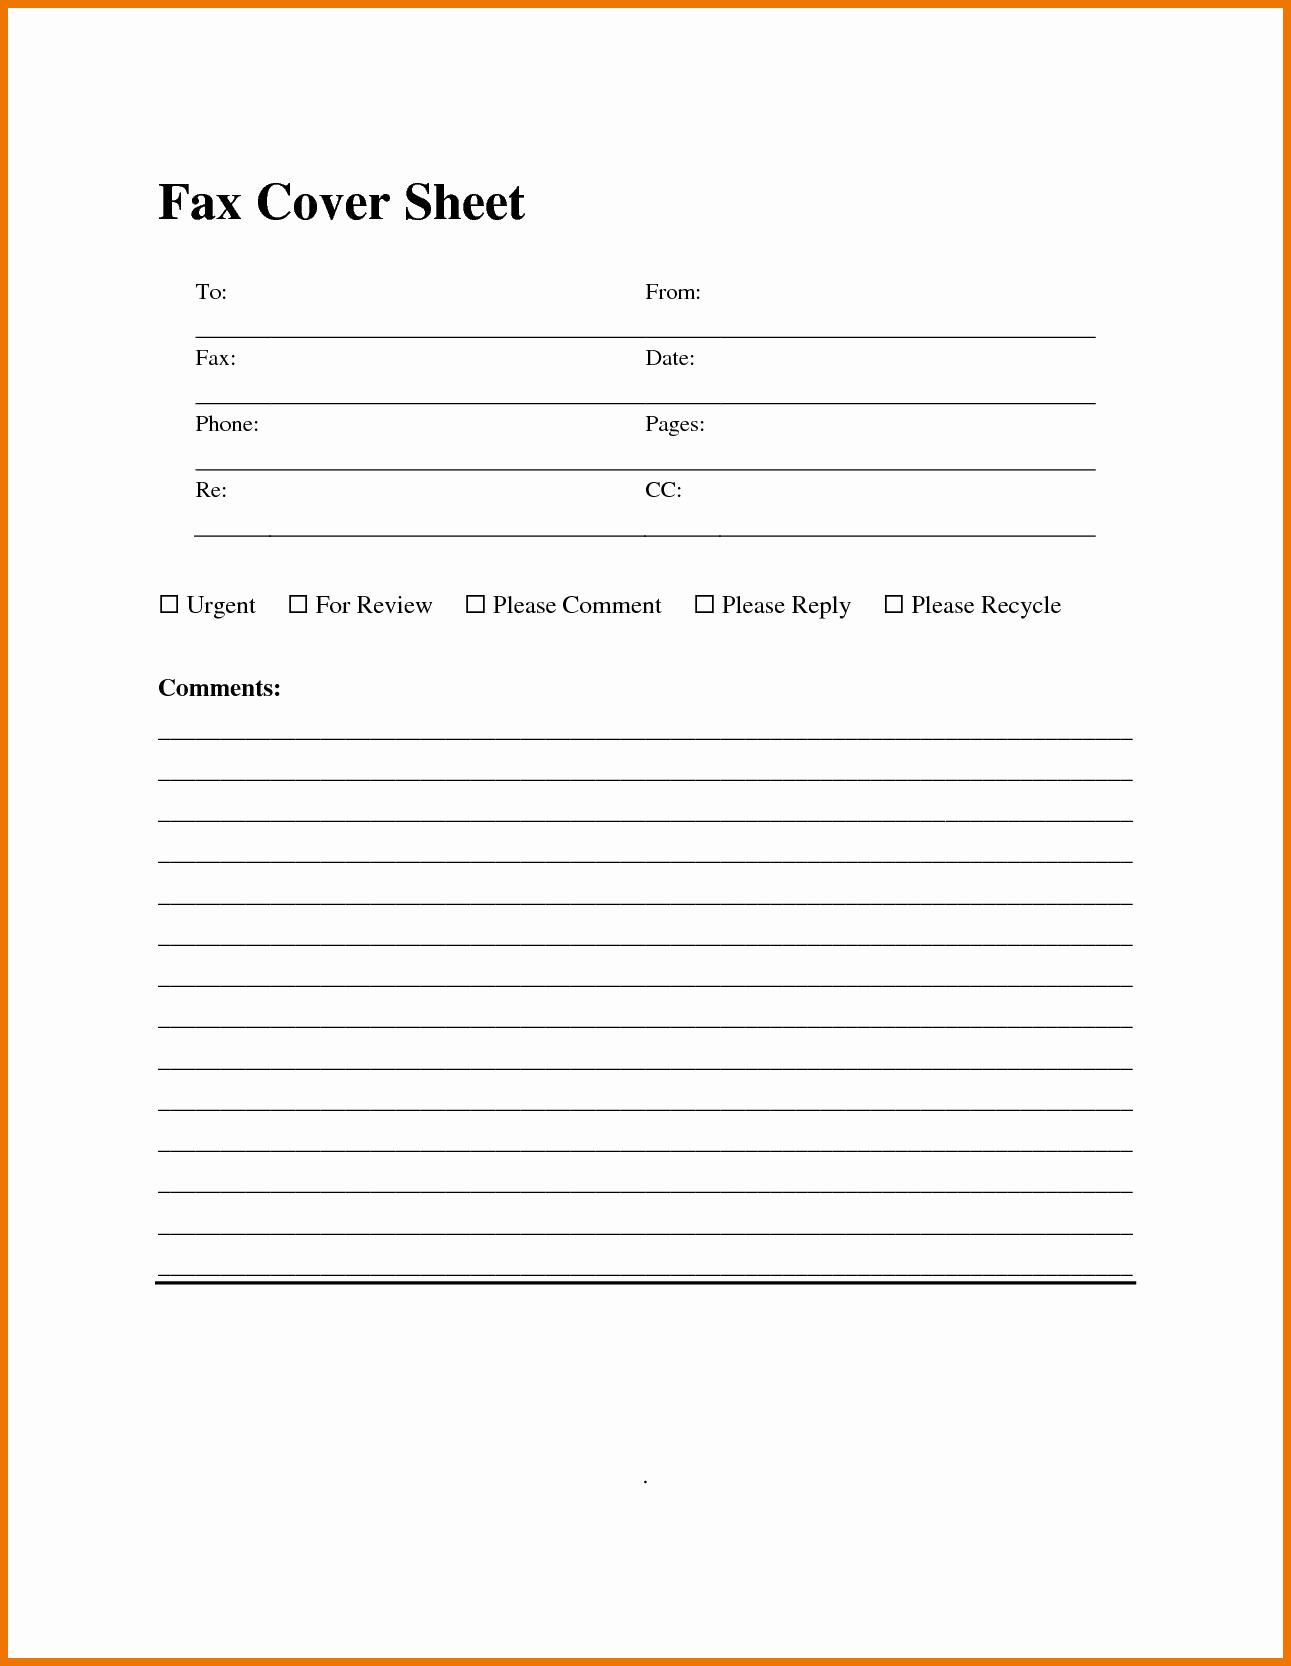 Fax Template Microsoft Word Elegant Fax Templates for Word Portablegasgrillweber